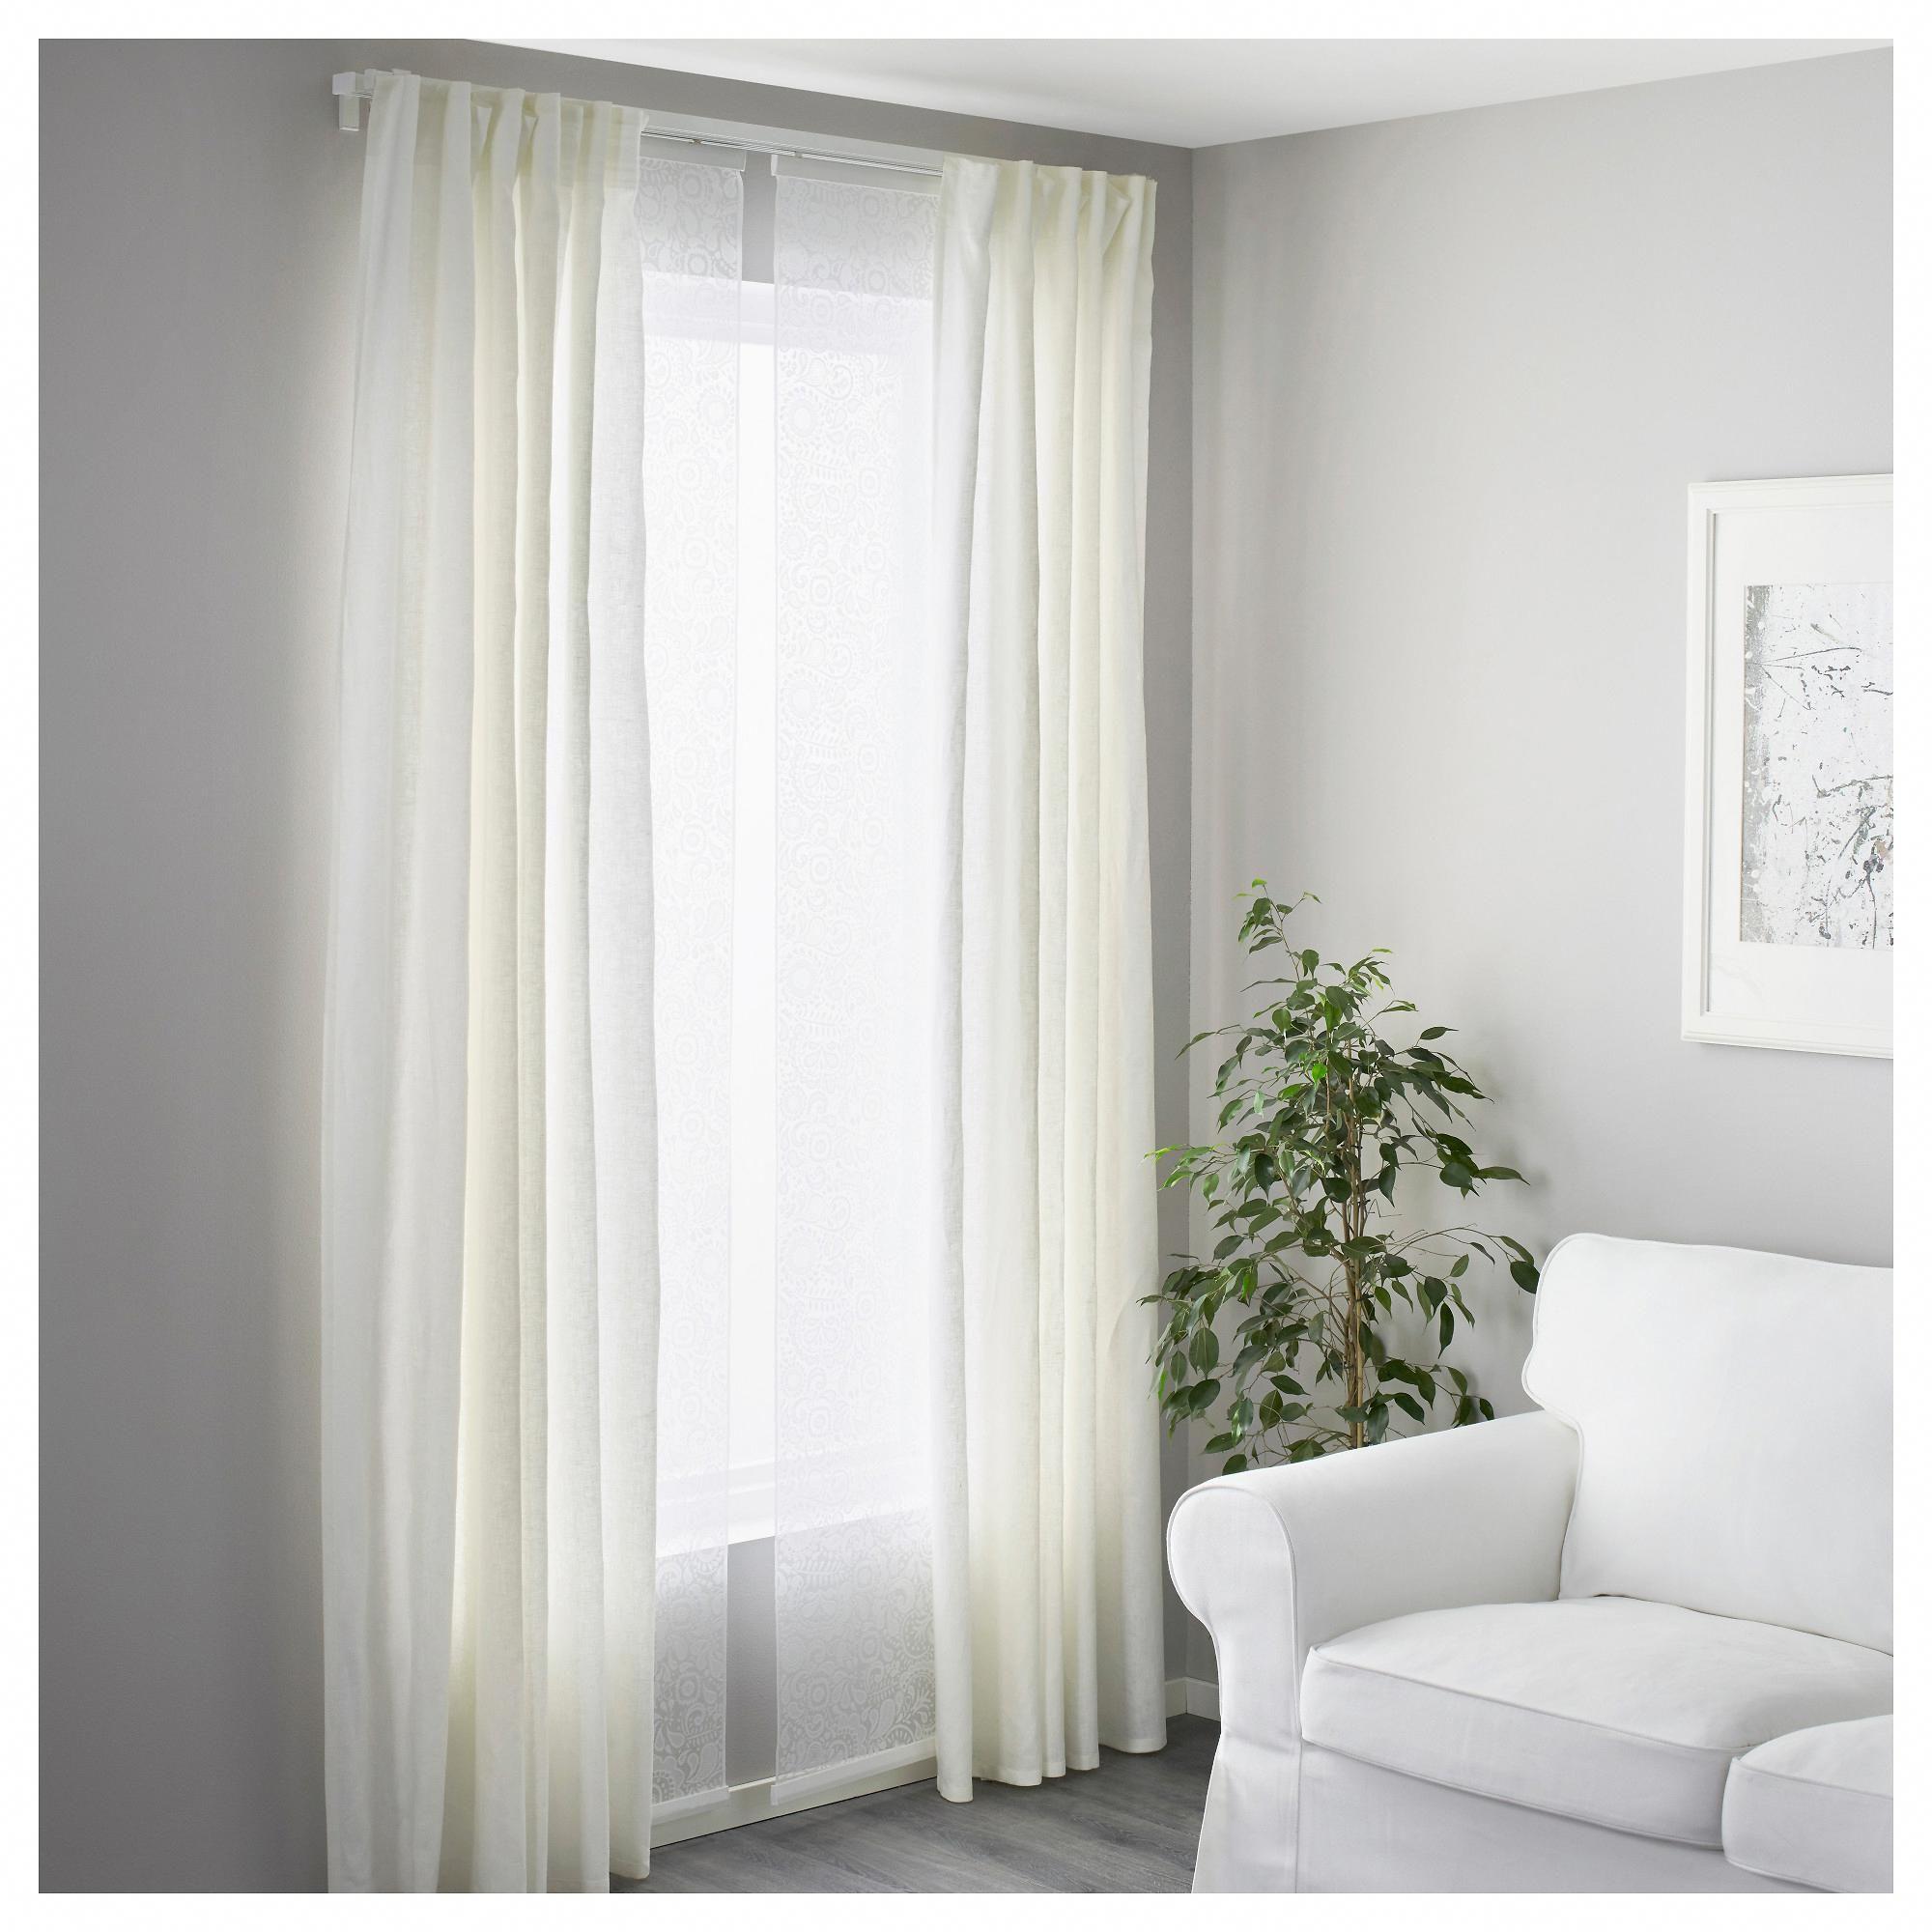 Ikea Vidga Triple Curtain Rail White Staircasedesign Cool